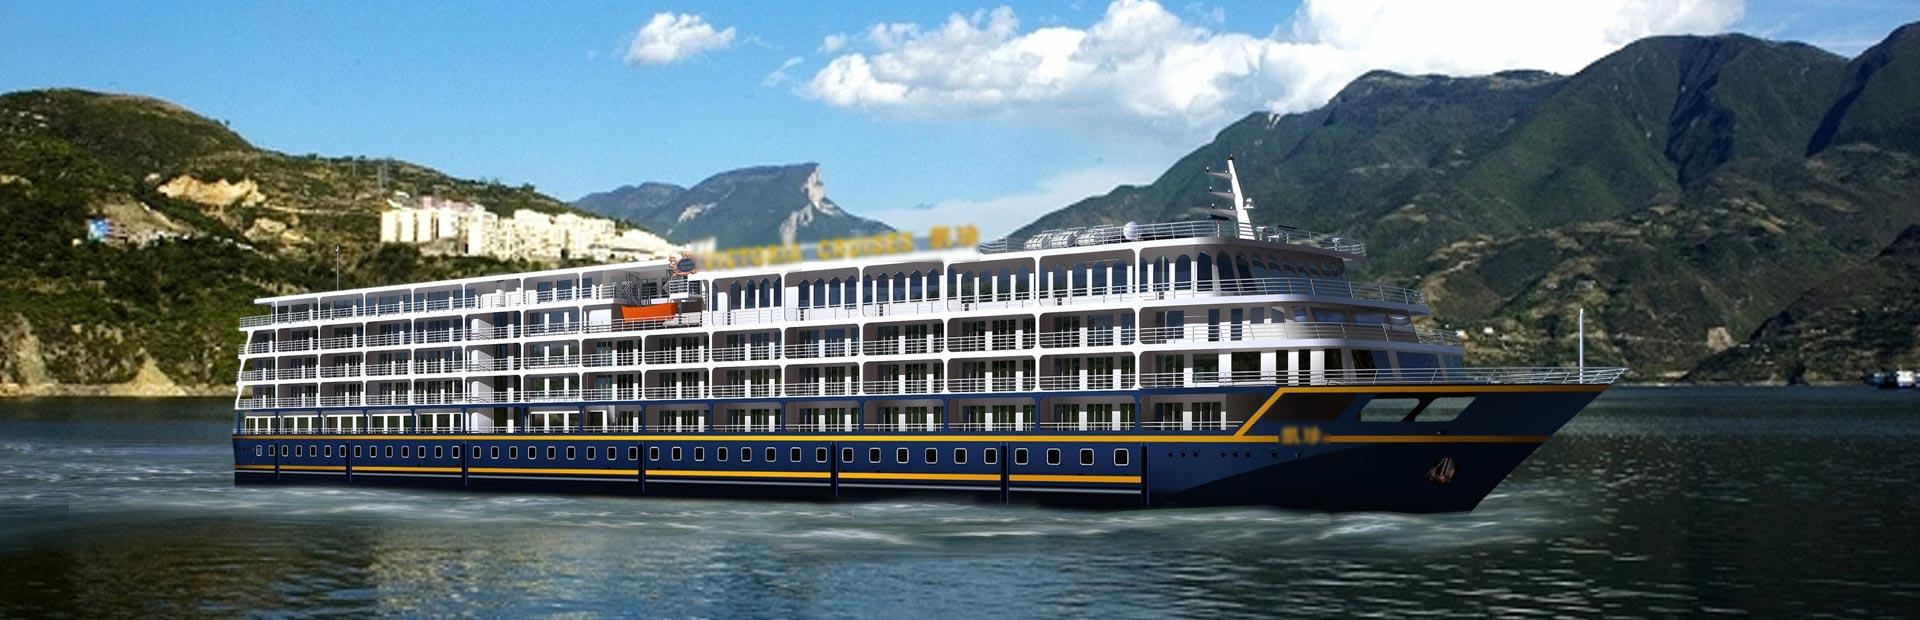 Chengdu Yangtze River Cruise Tour, Yangtze Cruise from Chengdu